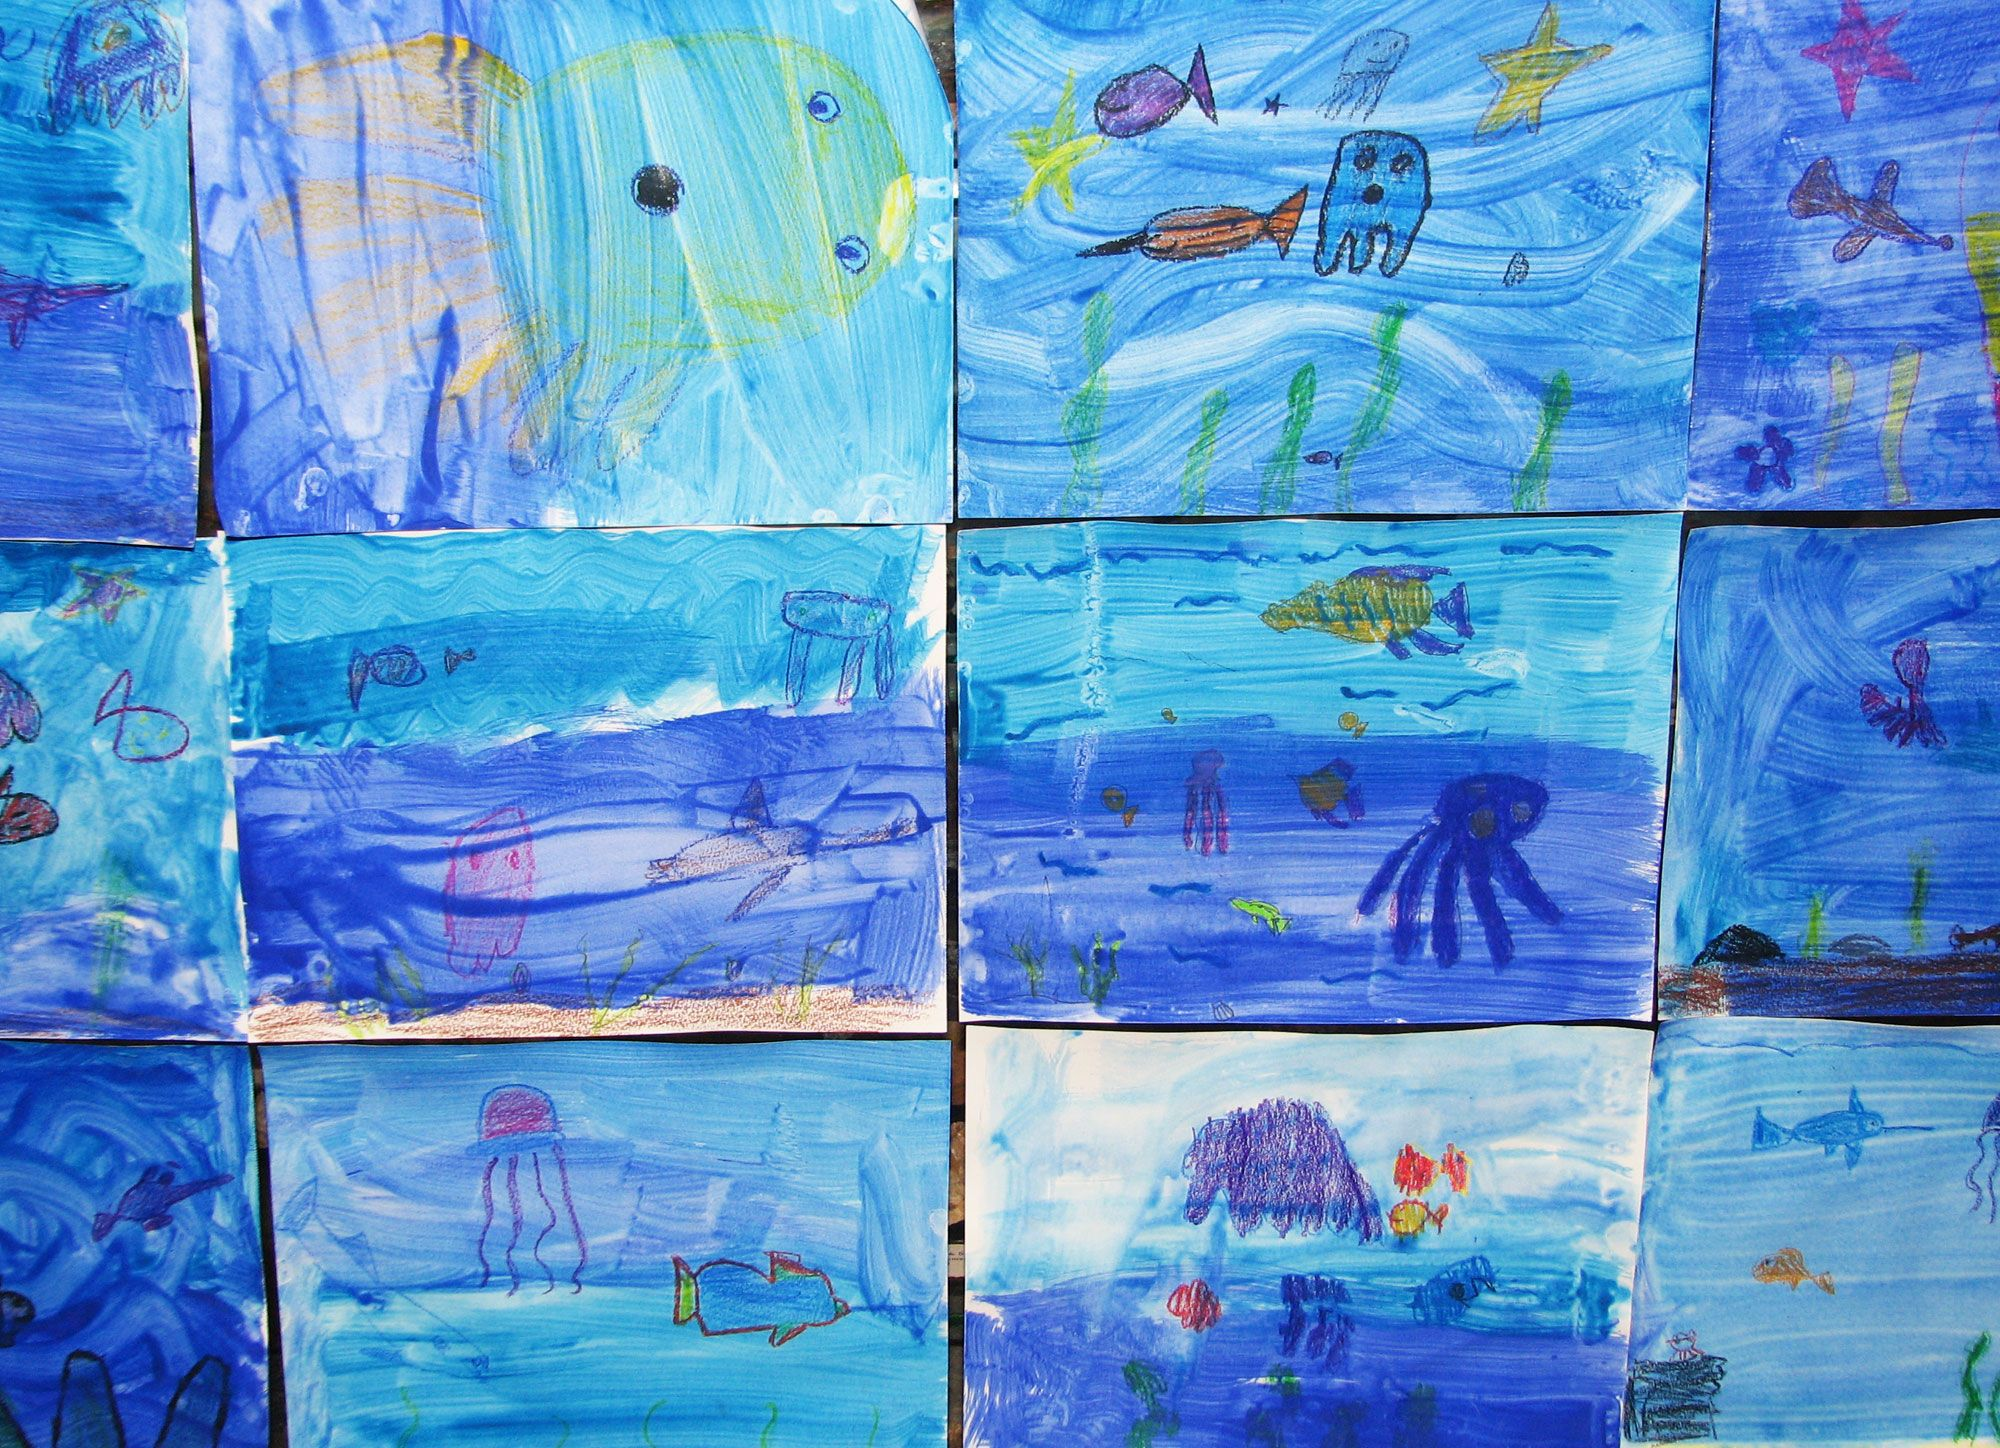 Fish Wax Resist Art Based On The Leo Lionni Book